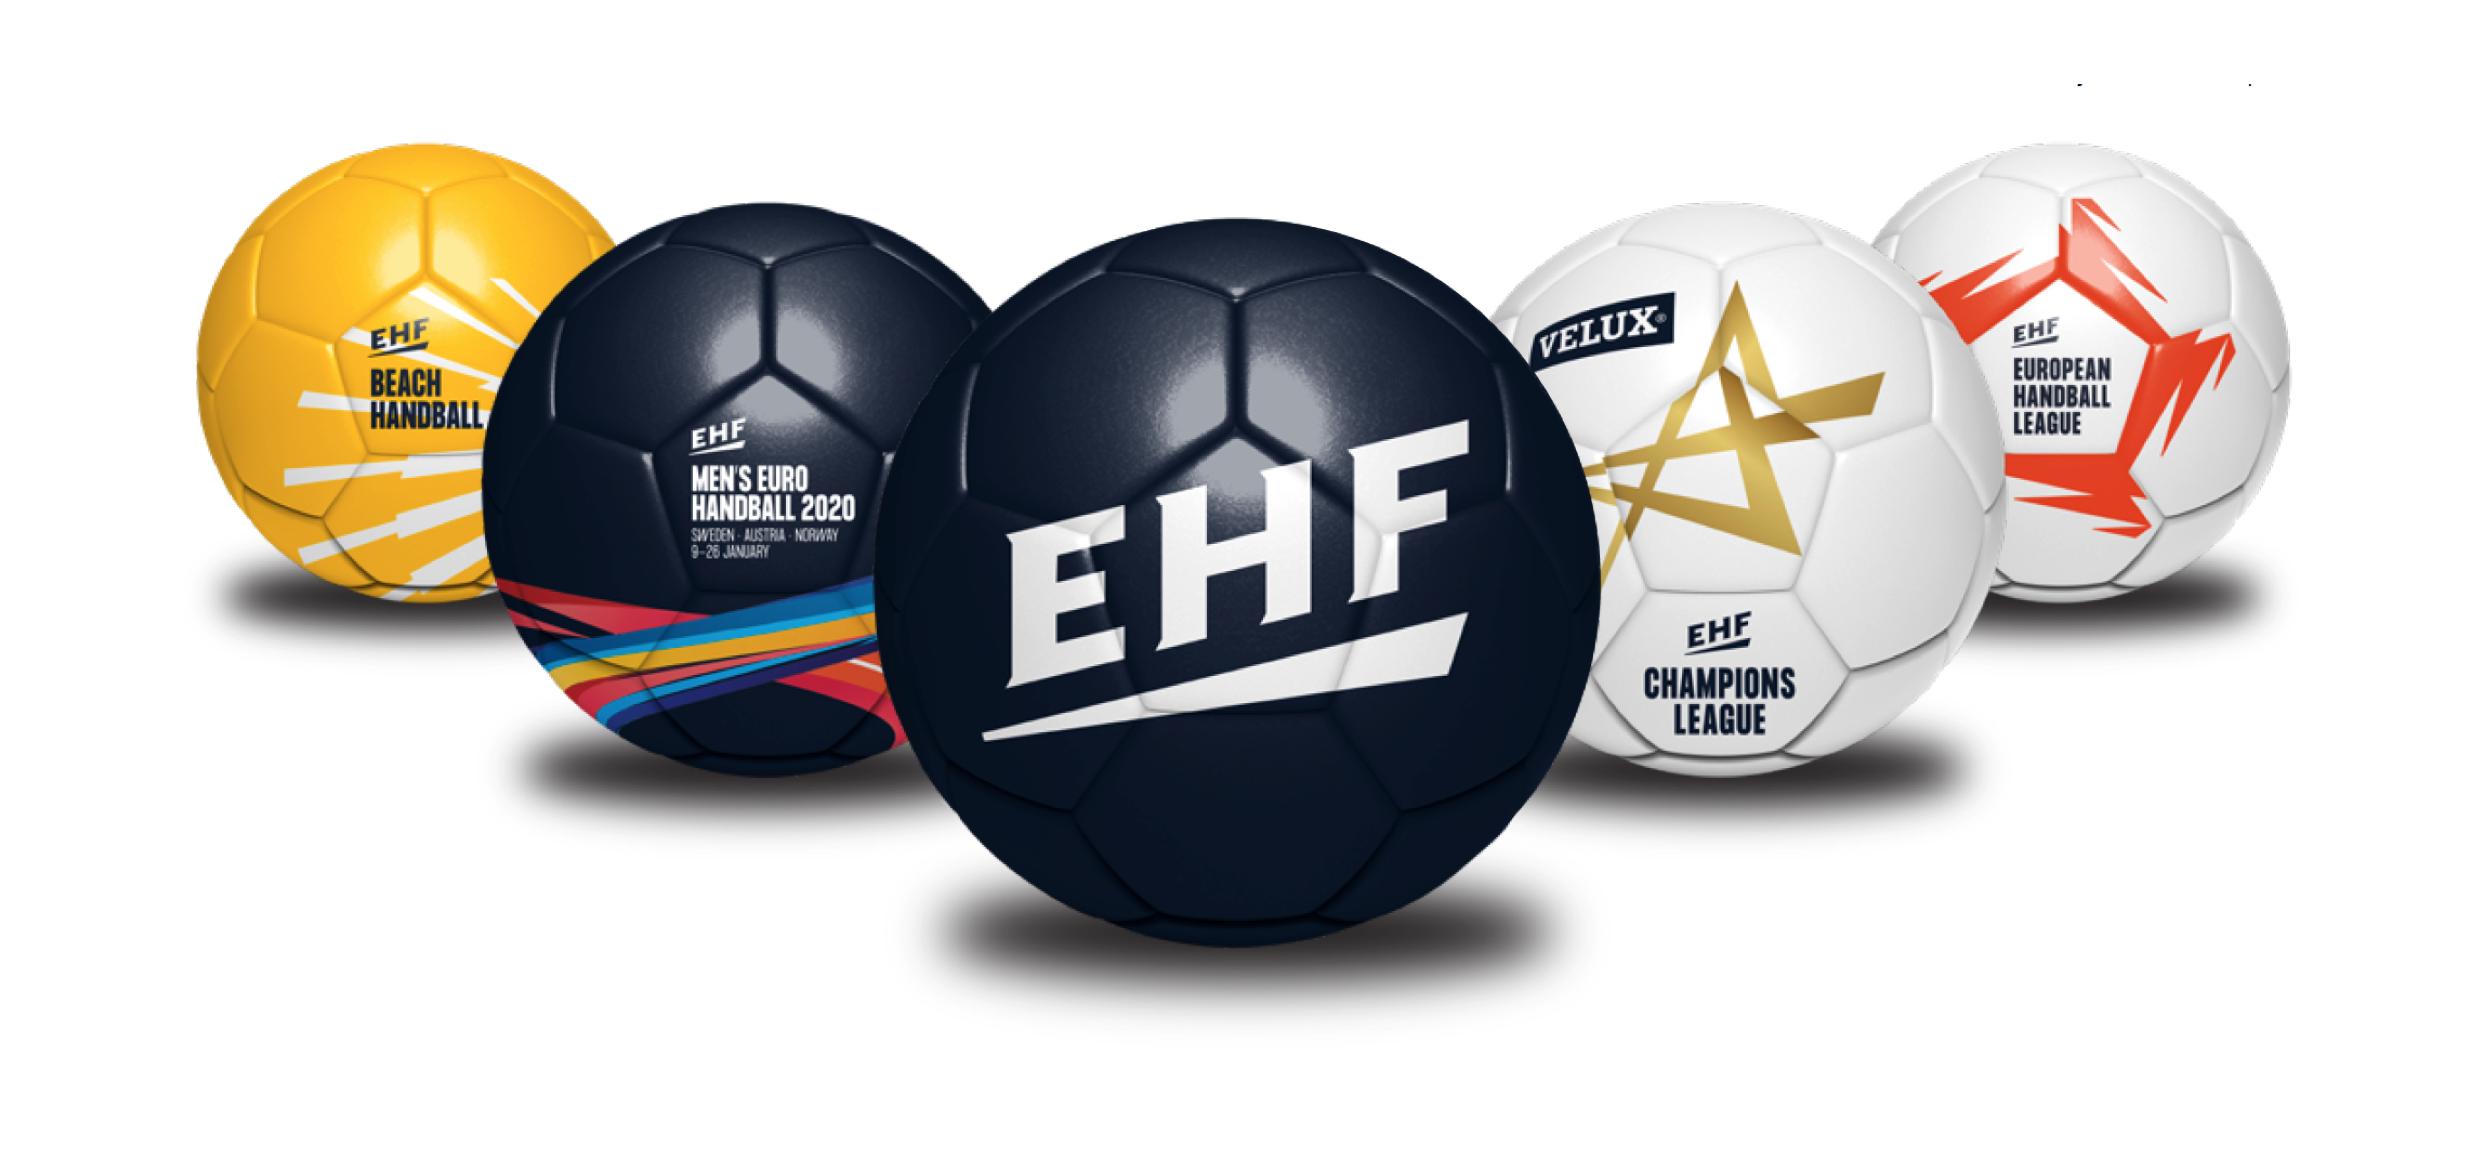 IDna Group Help Rejuvenate European Handball Federation Branding